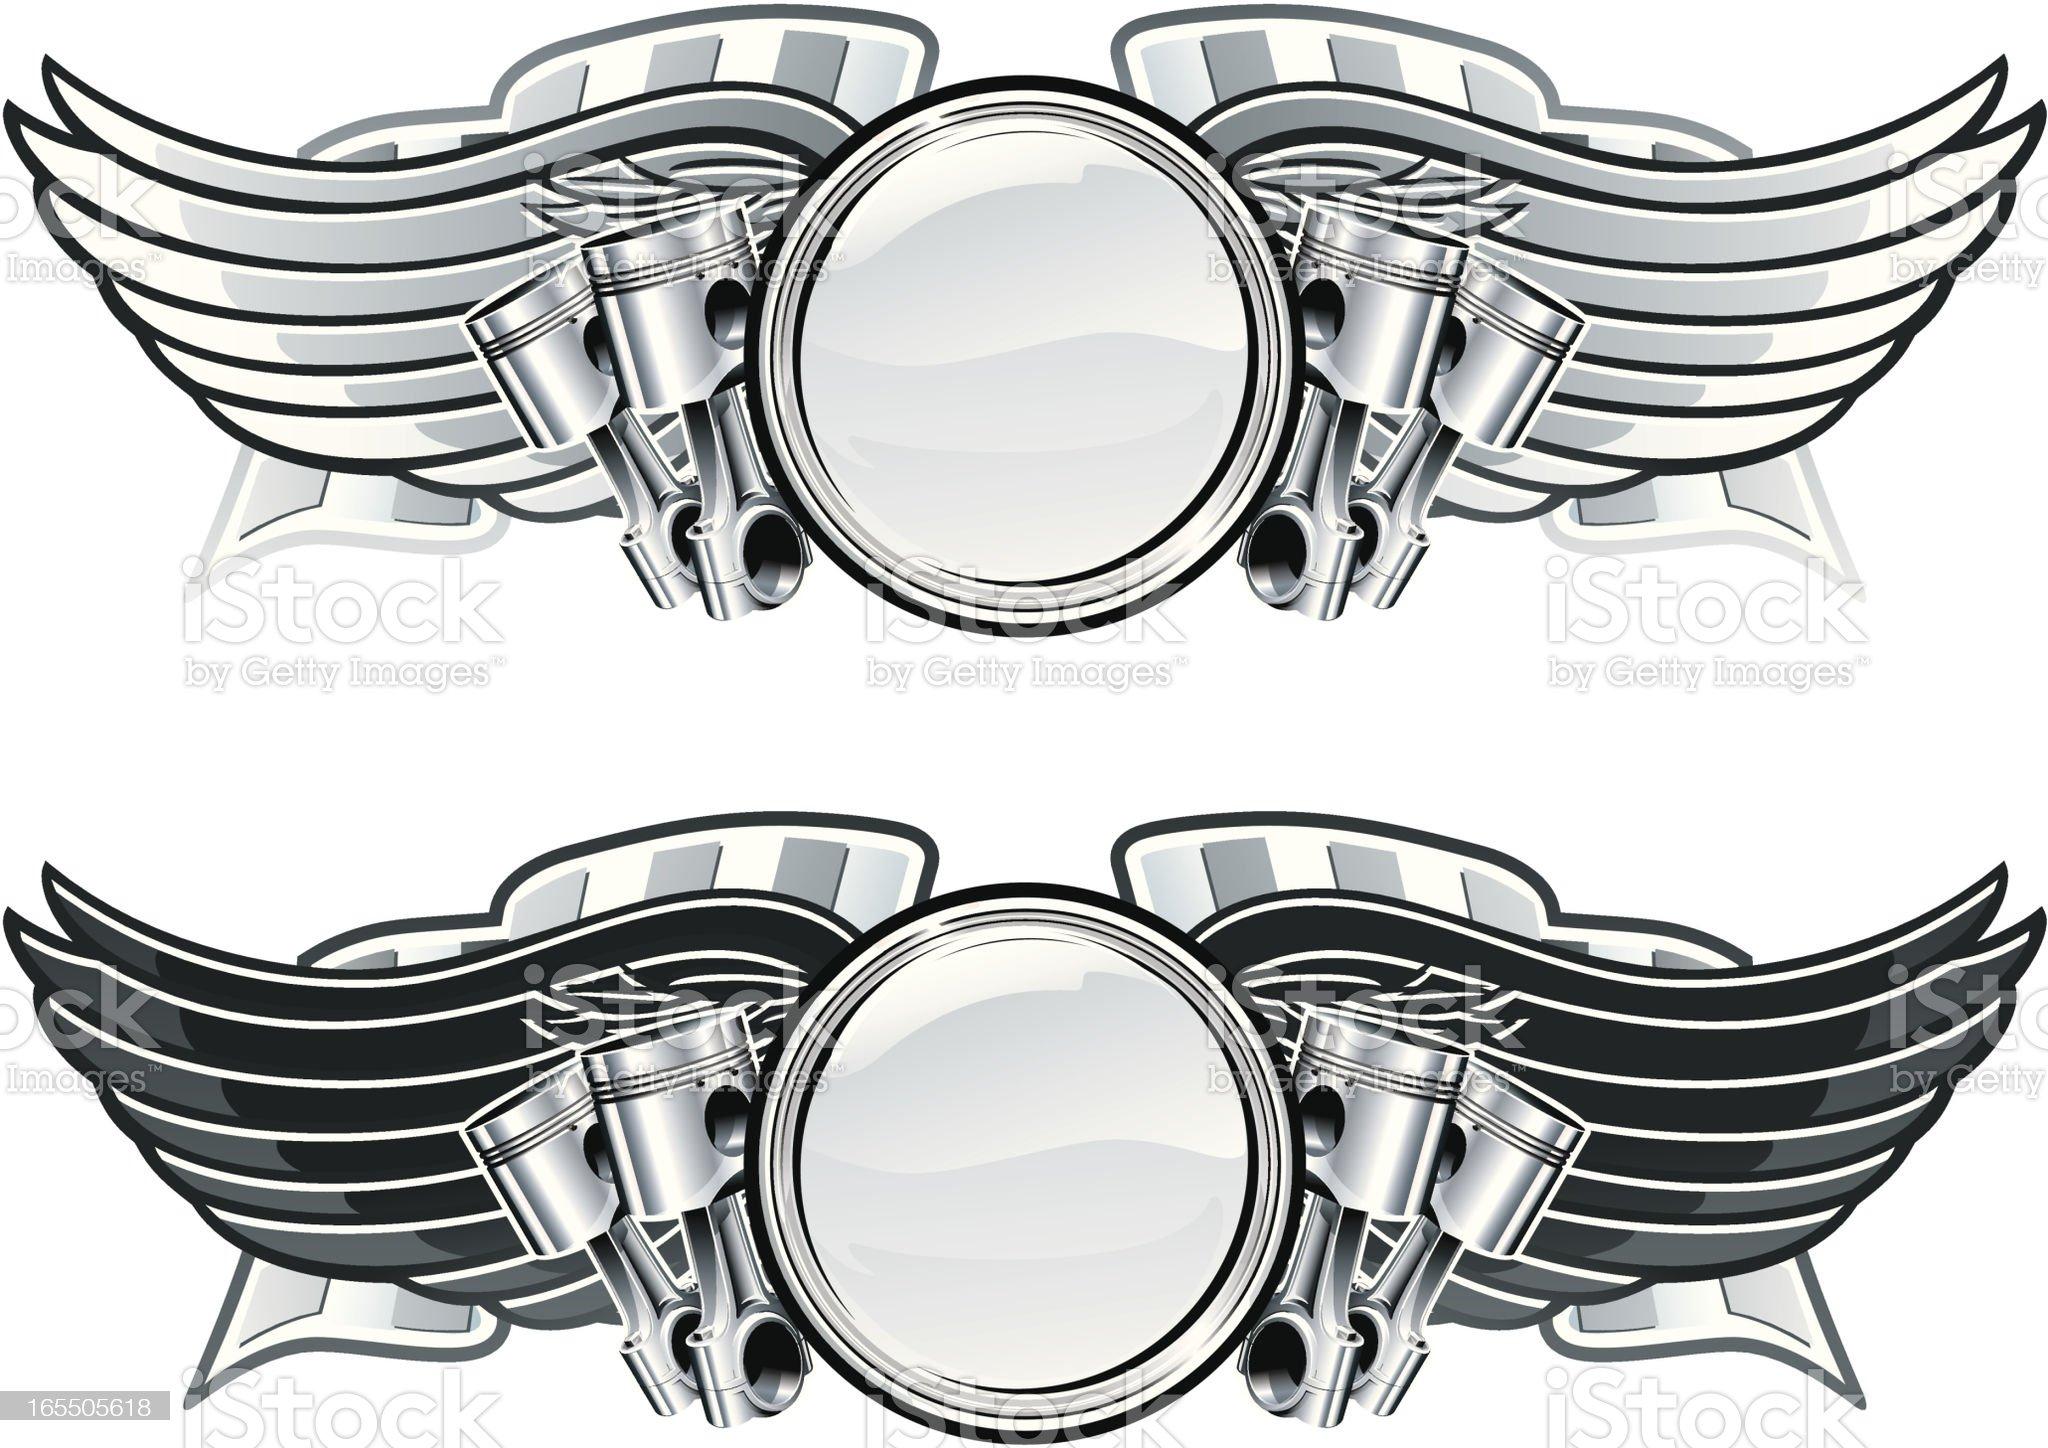 Winged racing emblems royalty-free stock vector art